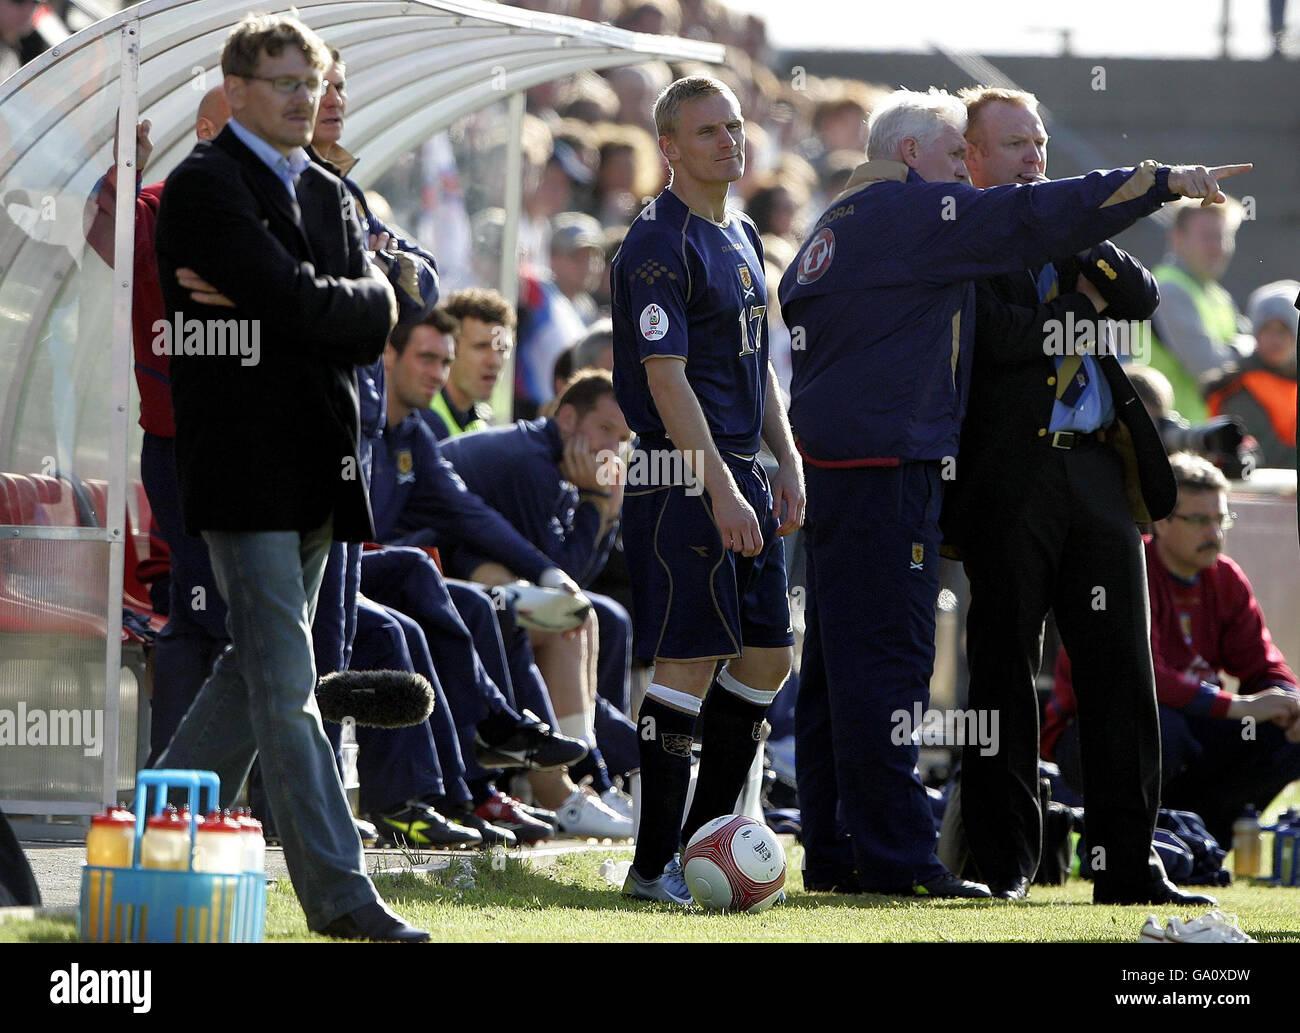 Soccer - Euro 2008 Qualifying - Group B - Faroe Island v Scotland - Svangaskard Stadium Stock Photo